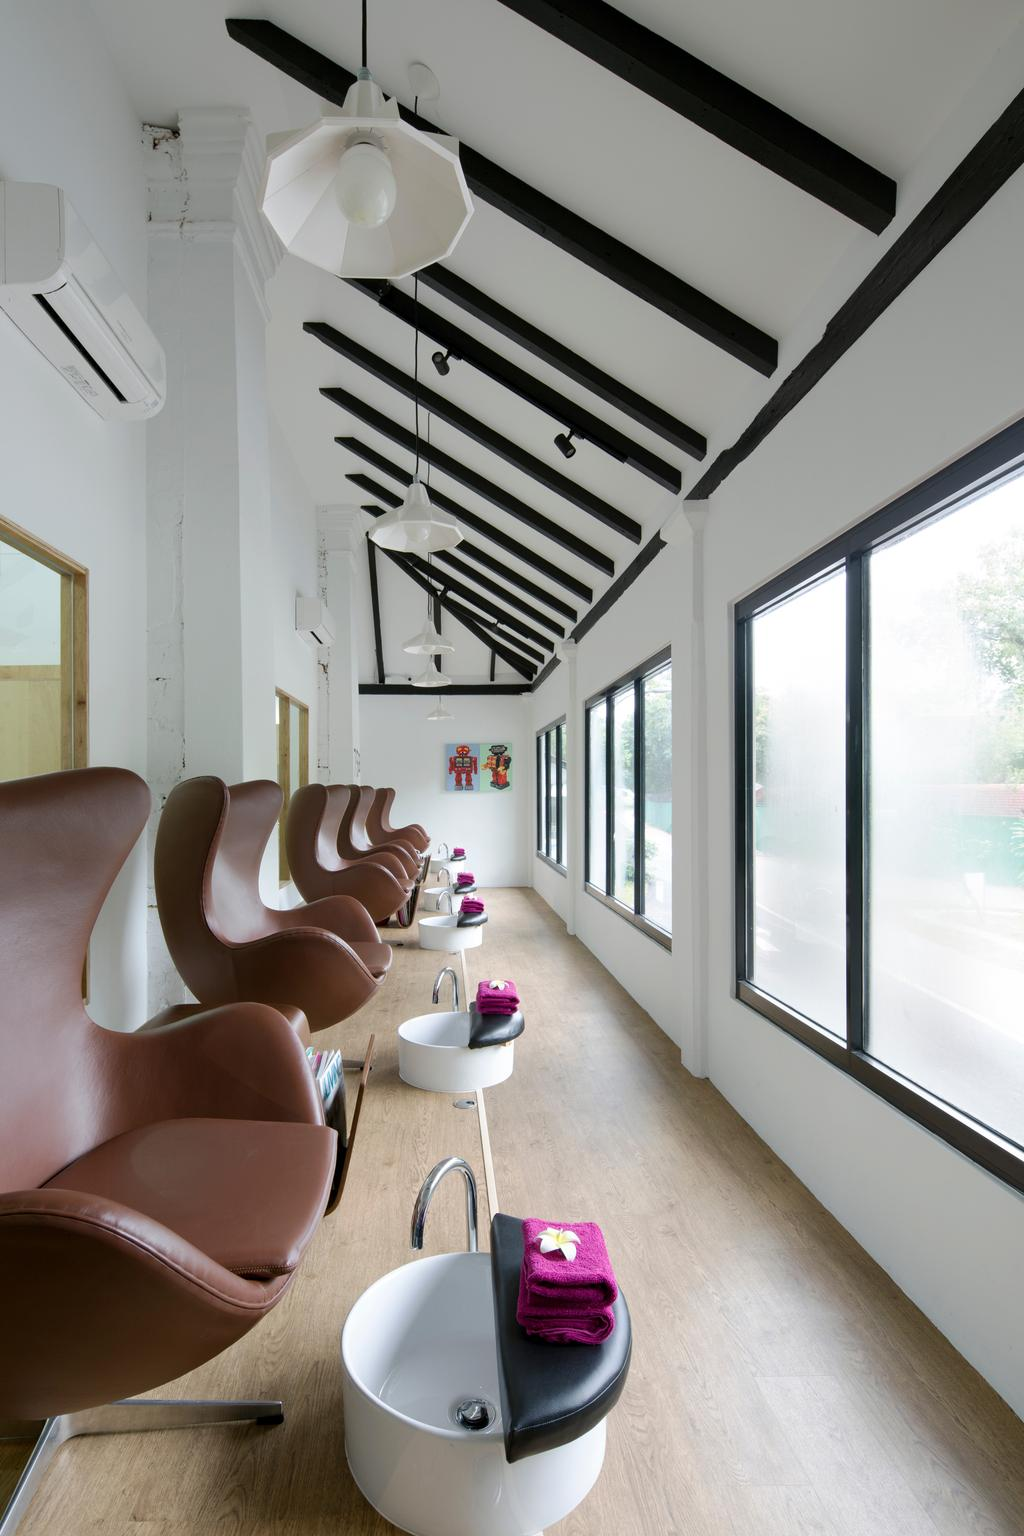 Loewen road, Commercial, Interior Designer, Design by Fifteen Pte Ltd, Contemporary, Chair, Furniture, Dining Room, Indoors, Interior Design, Room